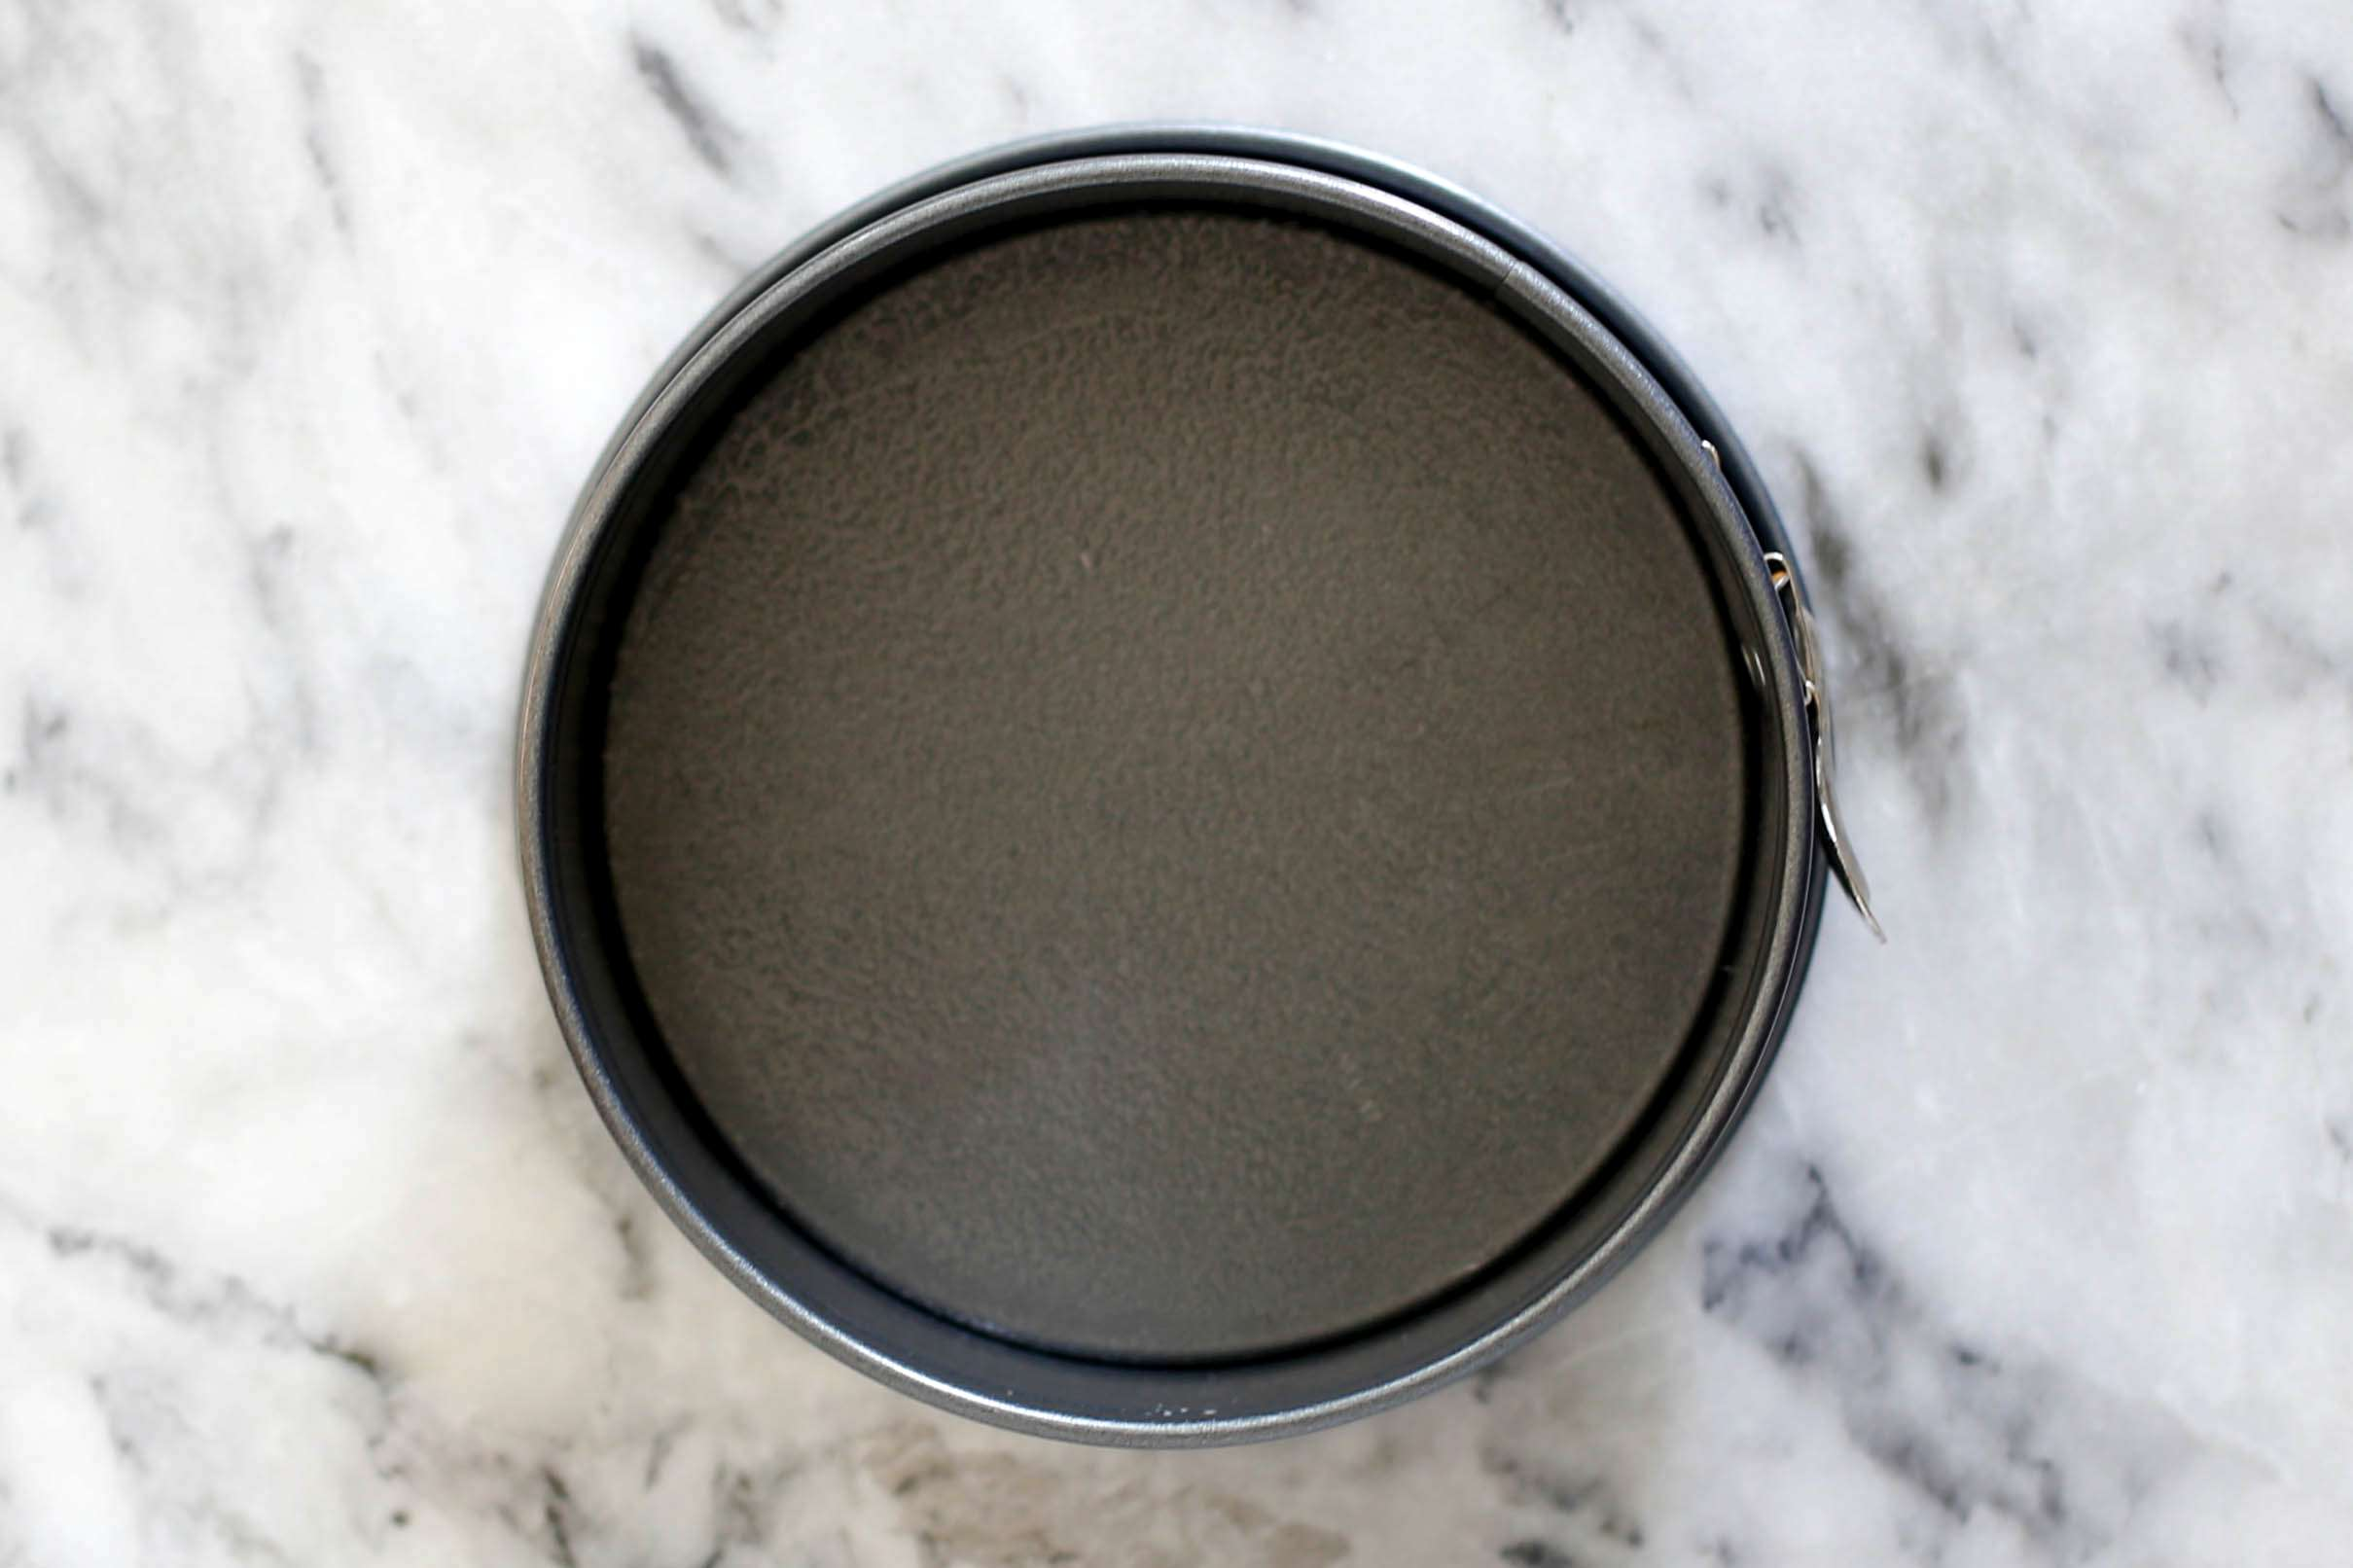 springform pan with nonstick cooking spray